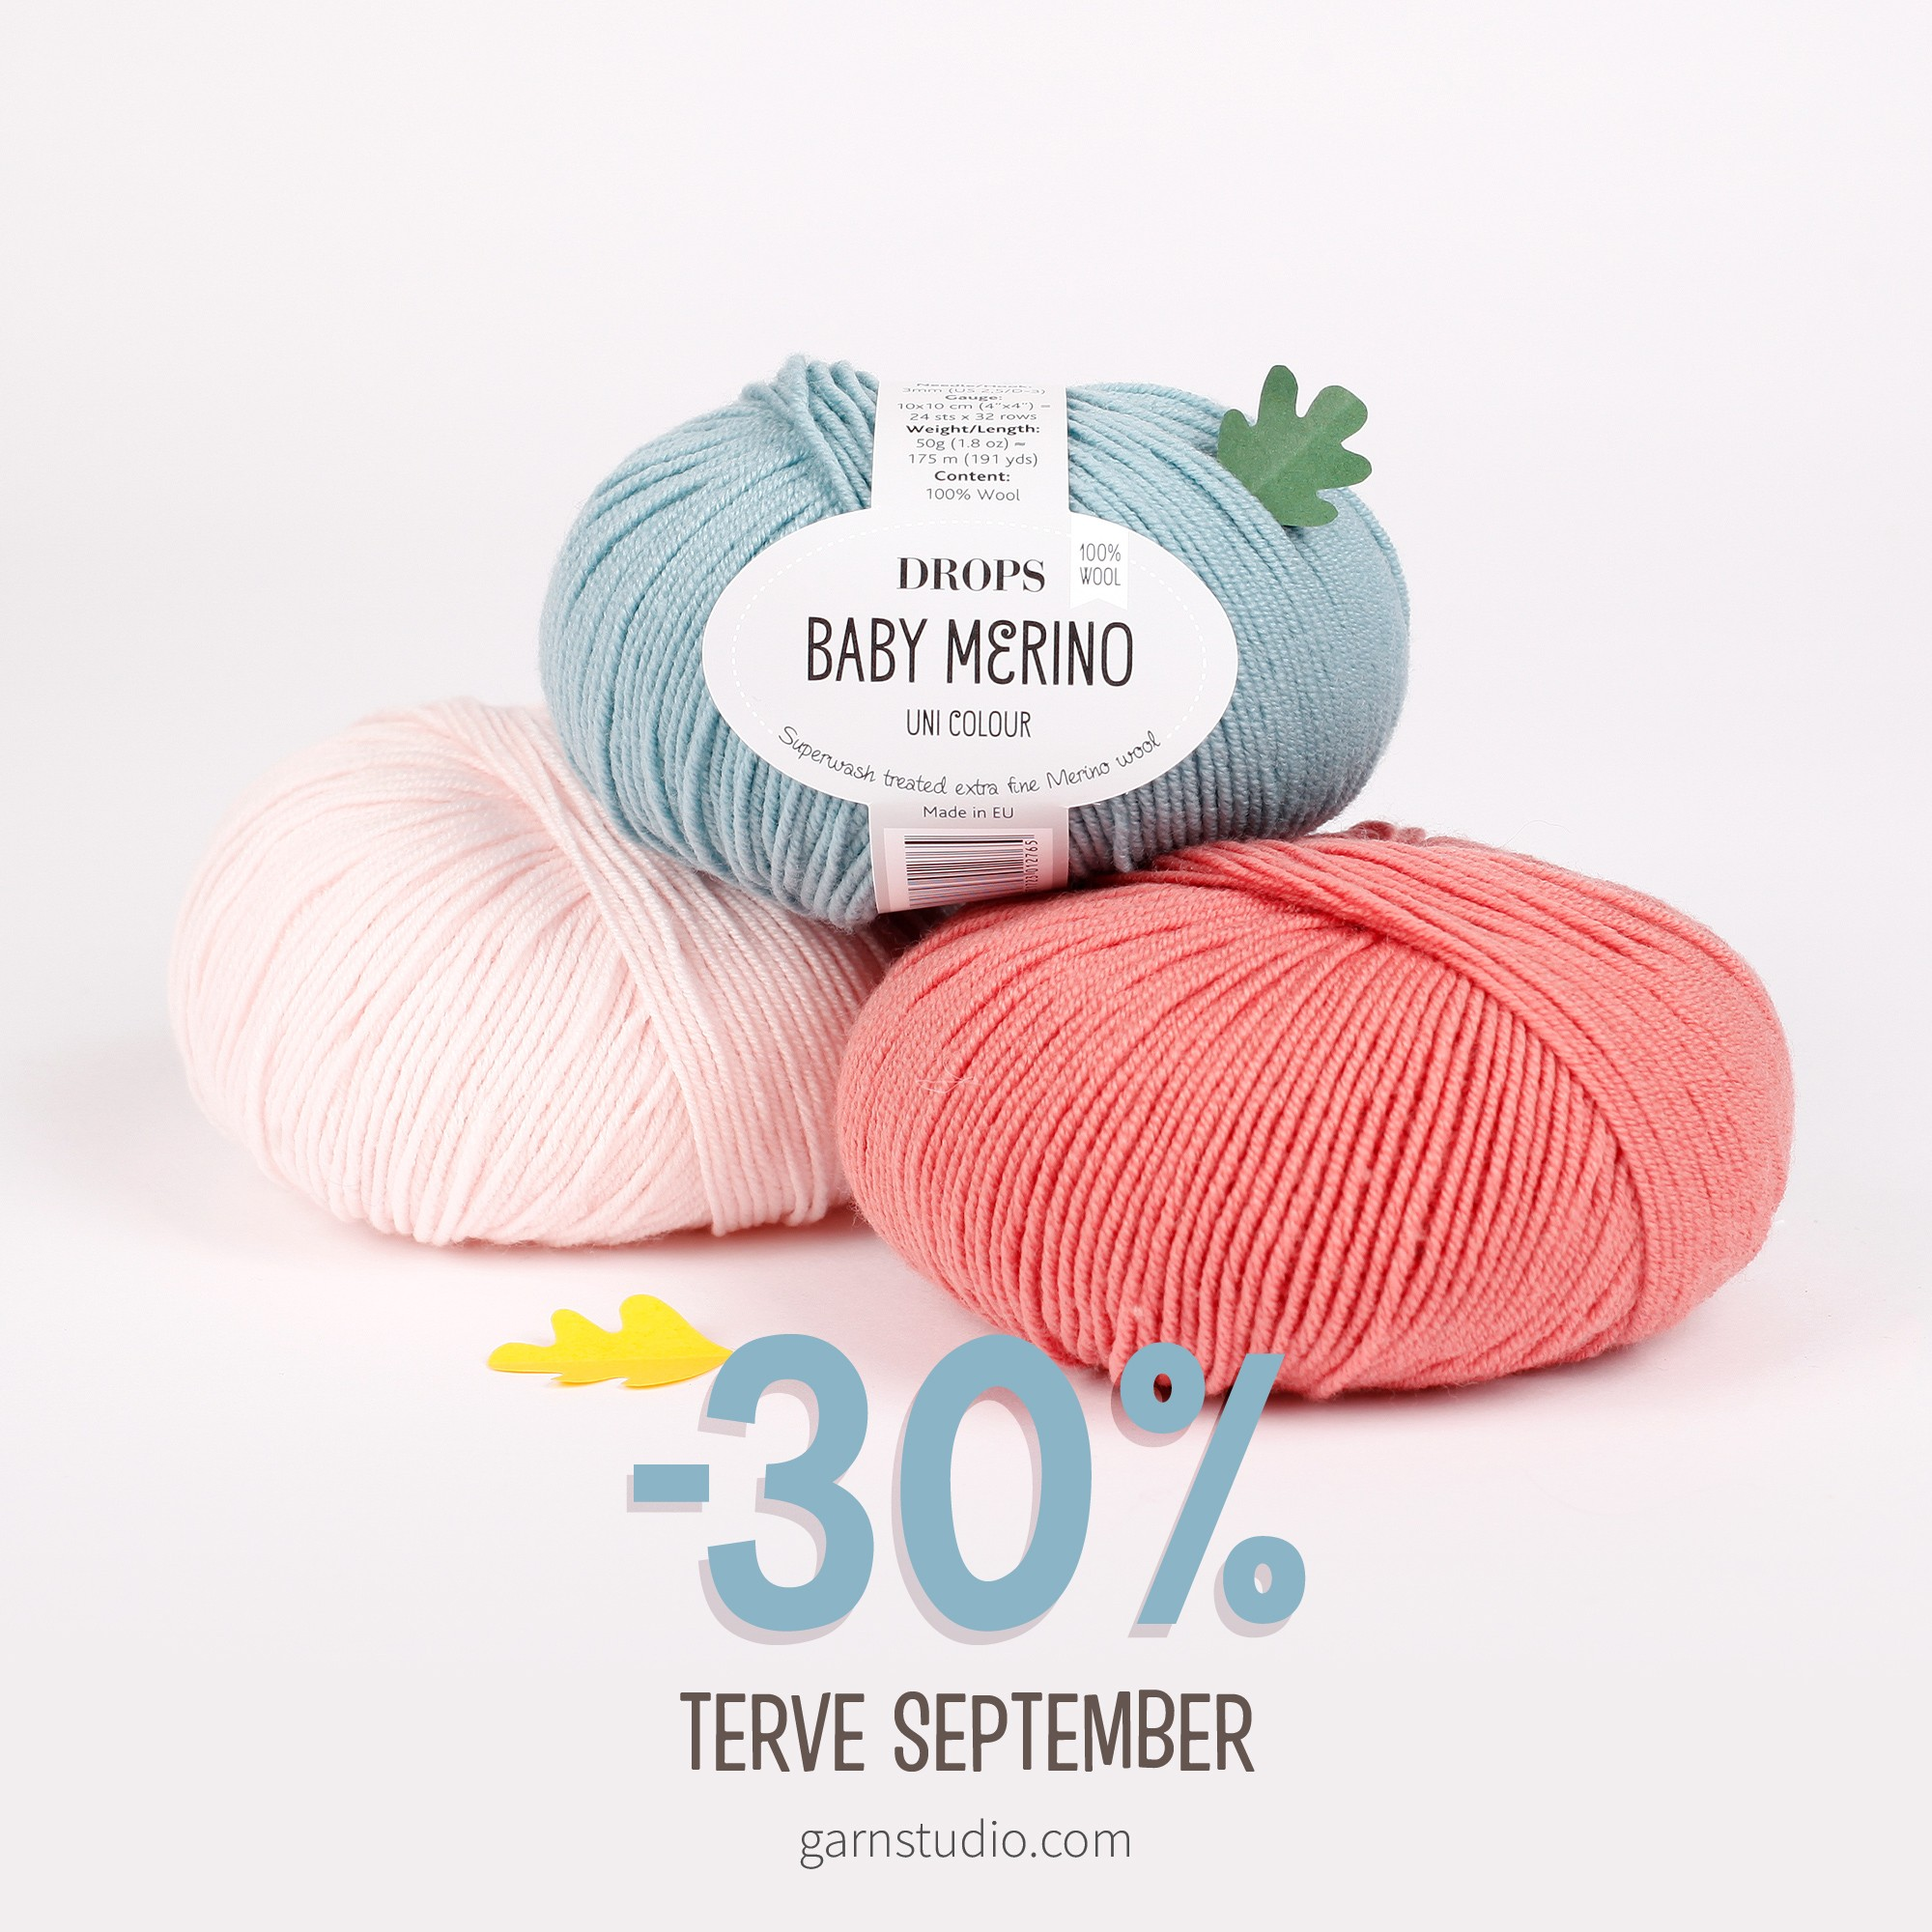 DROPS Baby Merino -30%